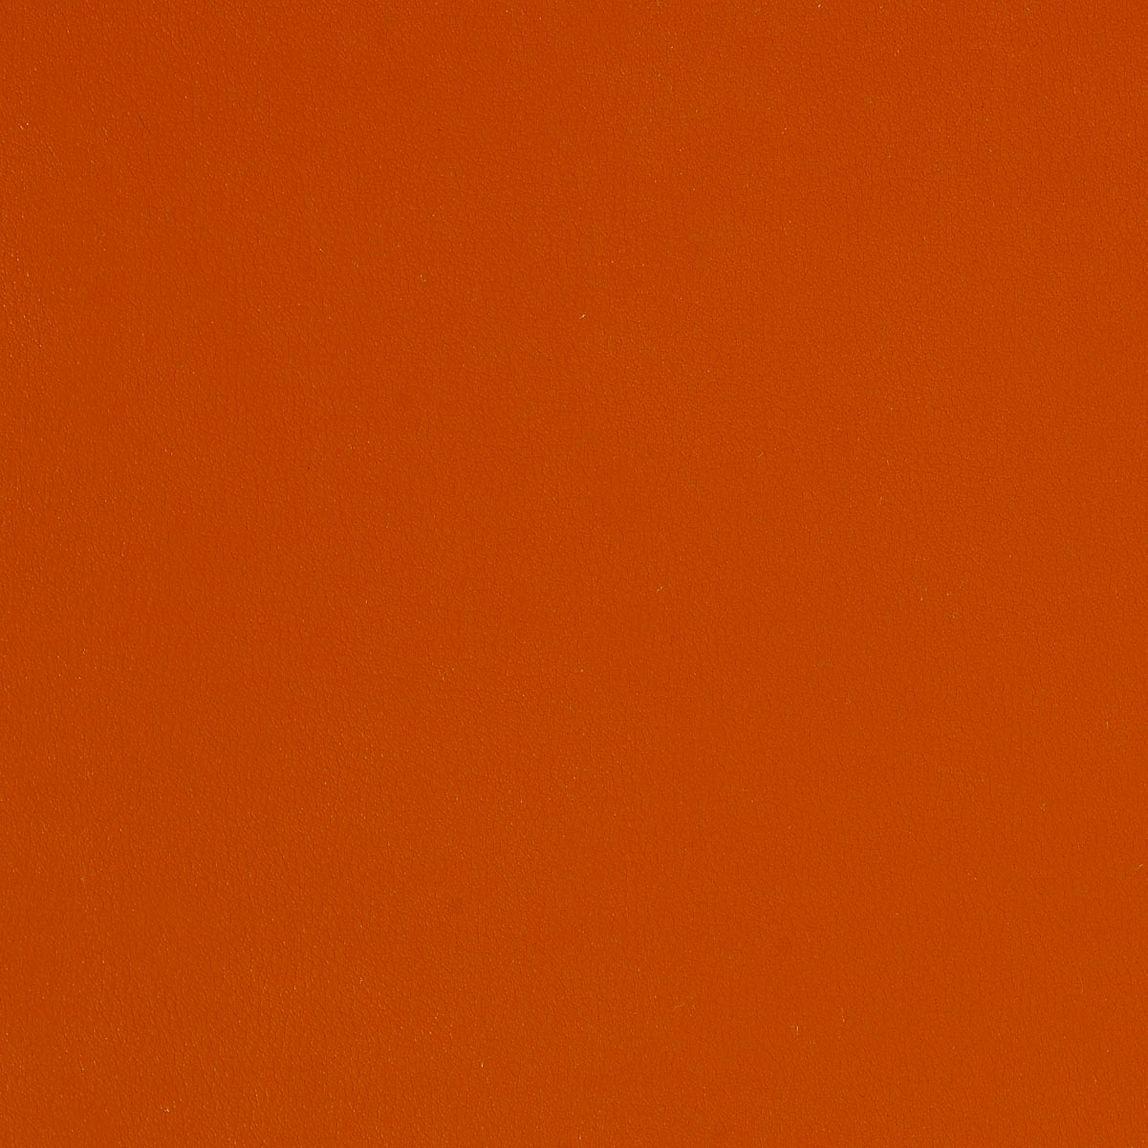 Silica Marigold Swatch